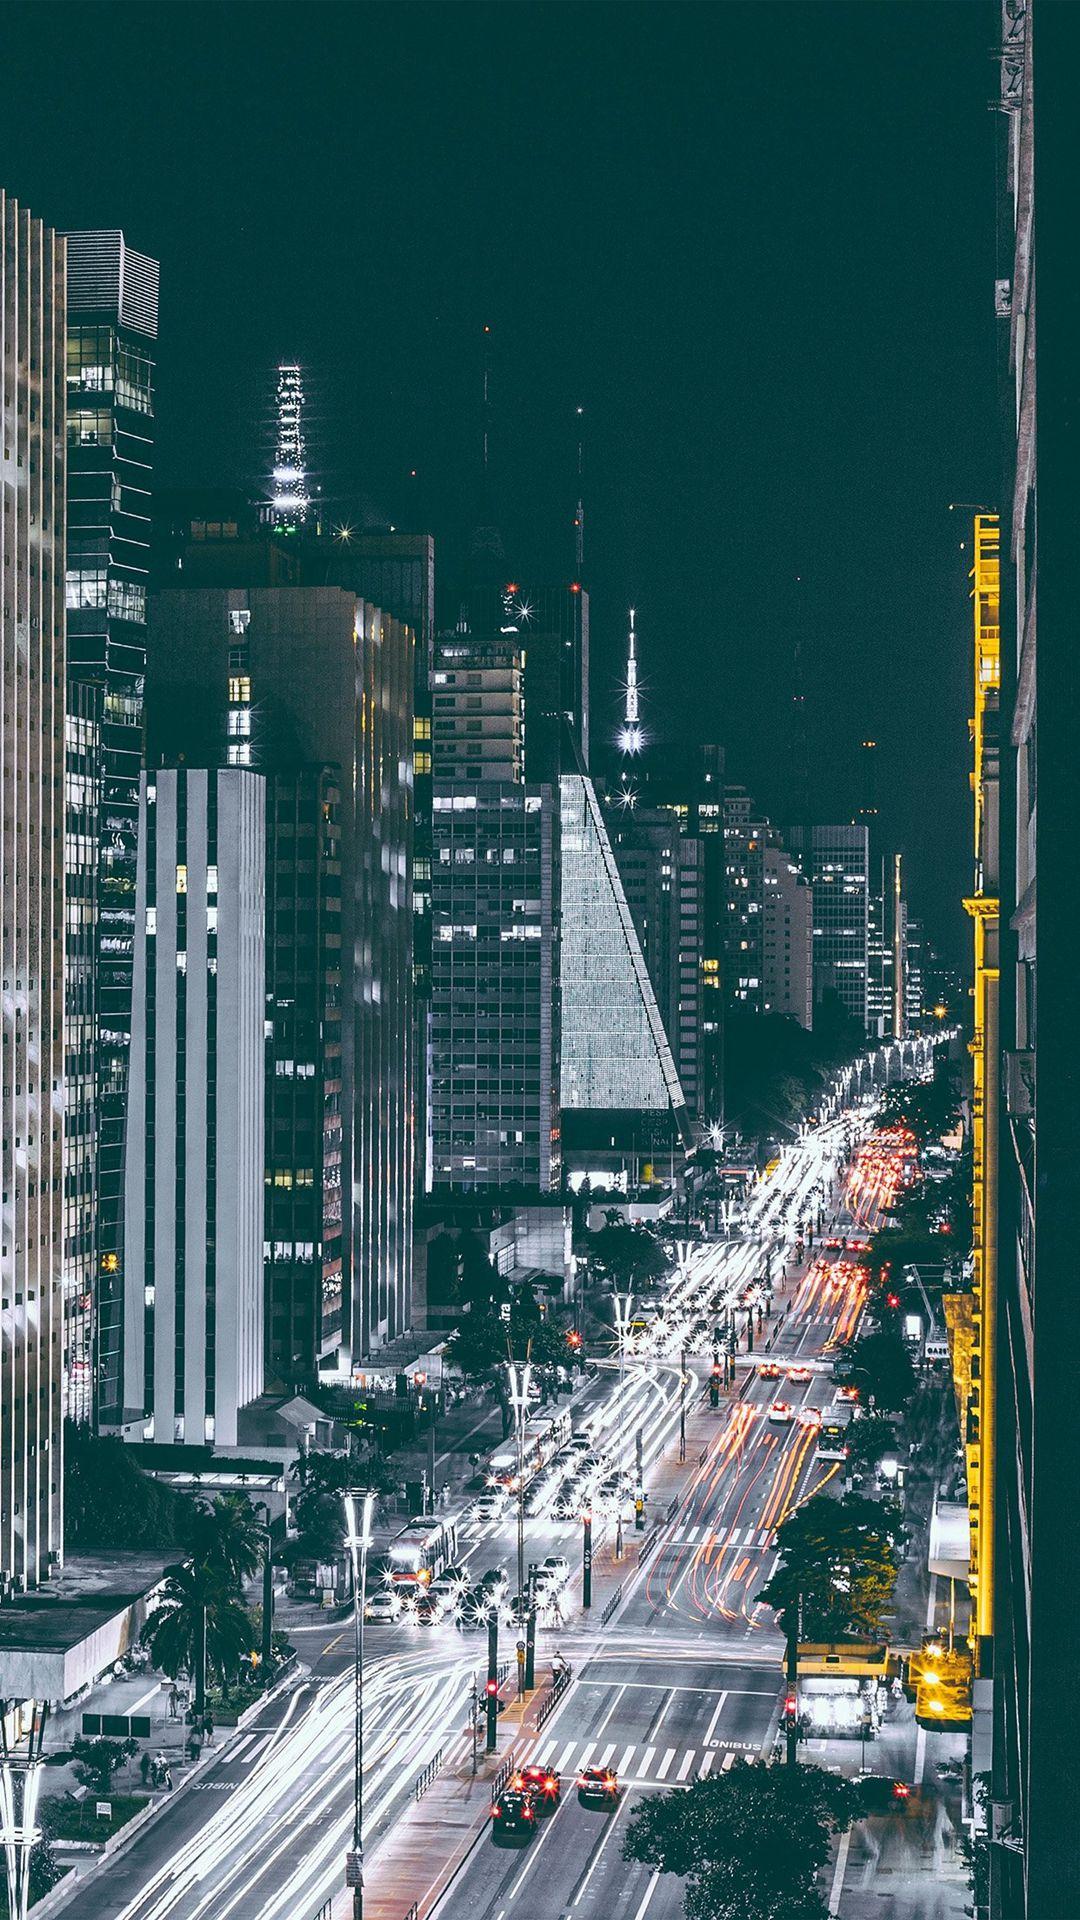 City Night View Urban Street iPhone 6 wallpaper